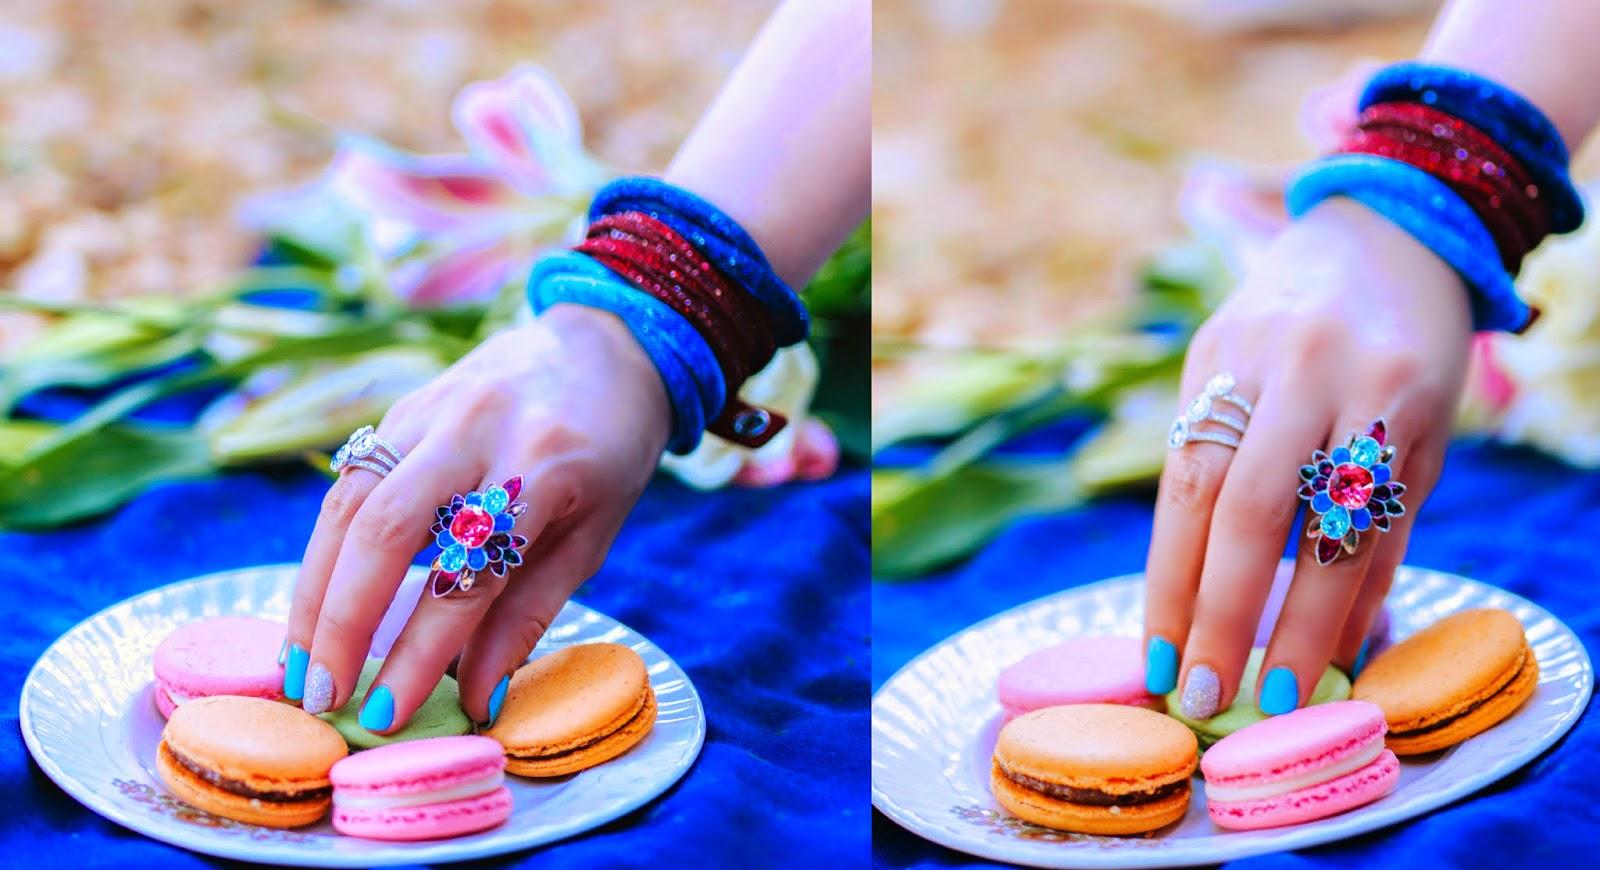 Swarovski Stardust Bracelets, Slake Bracelet, Cardinal Floral Ring, Patel Christie Ring Set